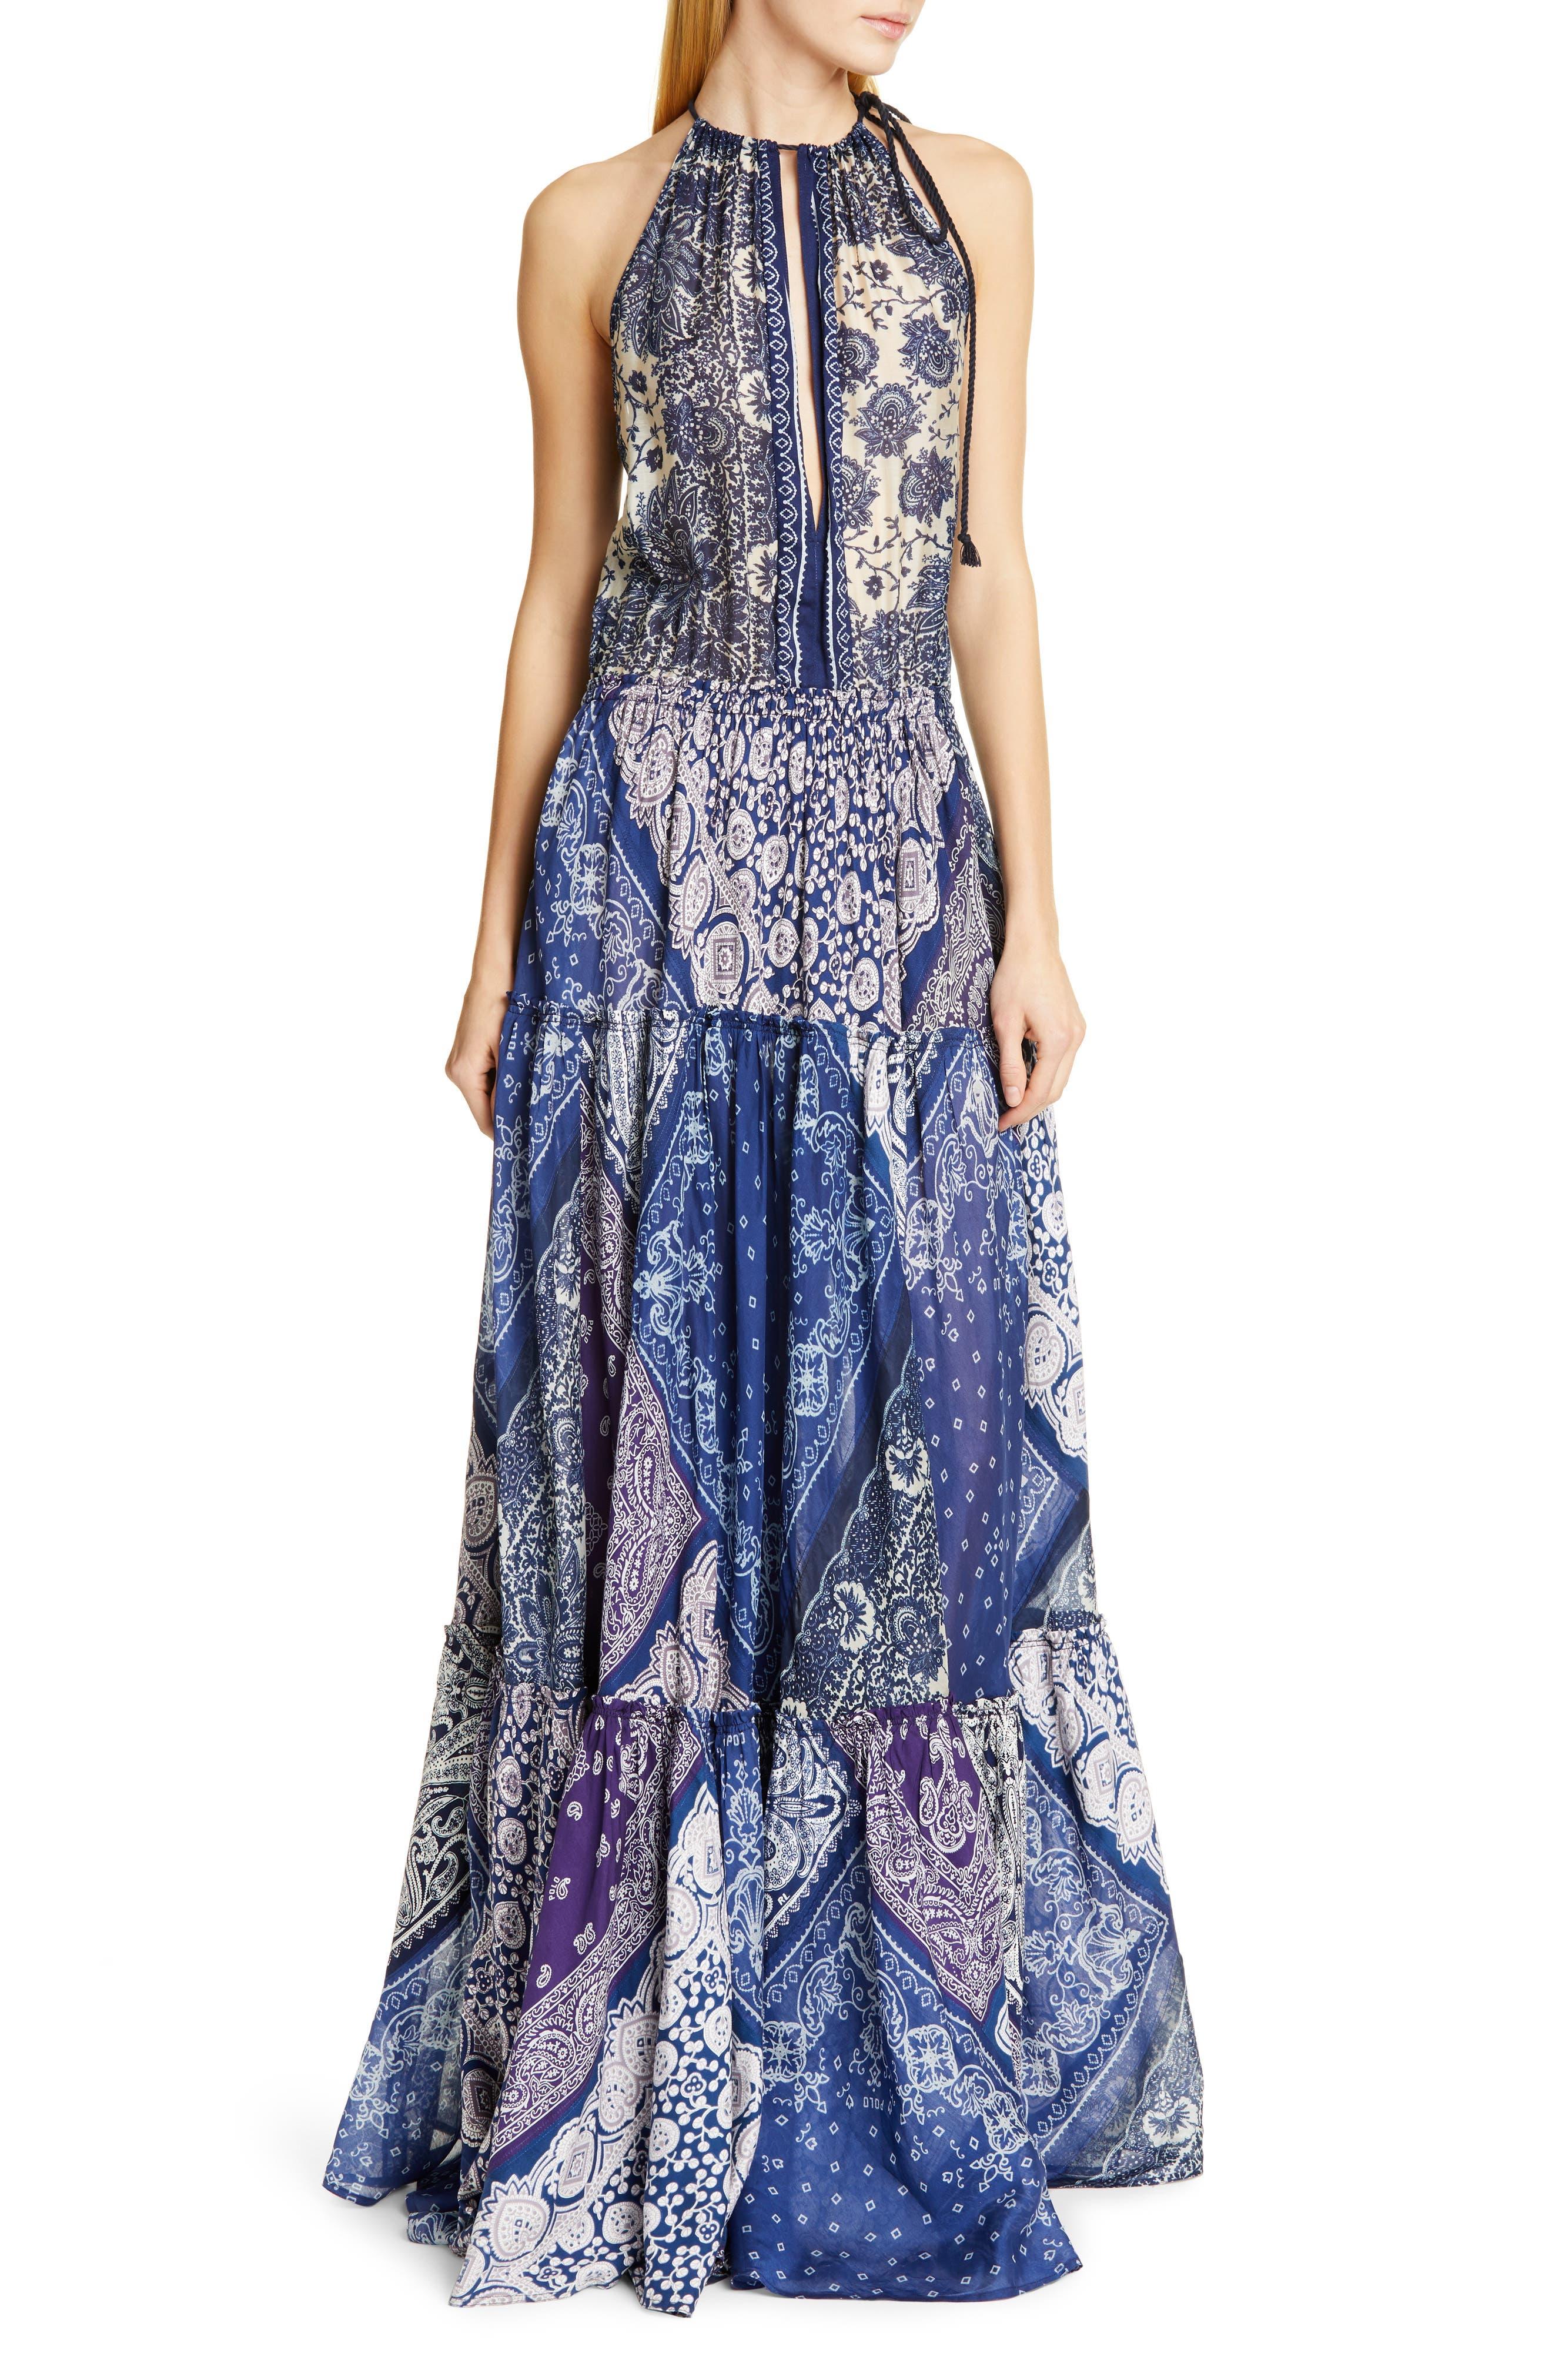 Polo Ralph Lauren Pattern Mix Keyhole Neck Sleeveless Maxi Dress, Blue